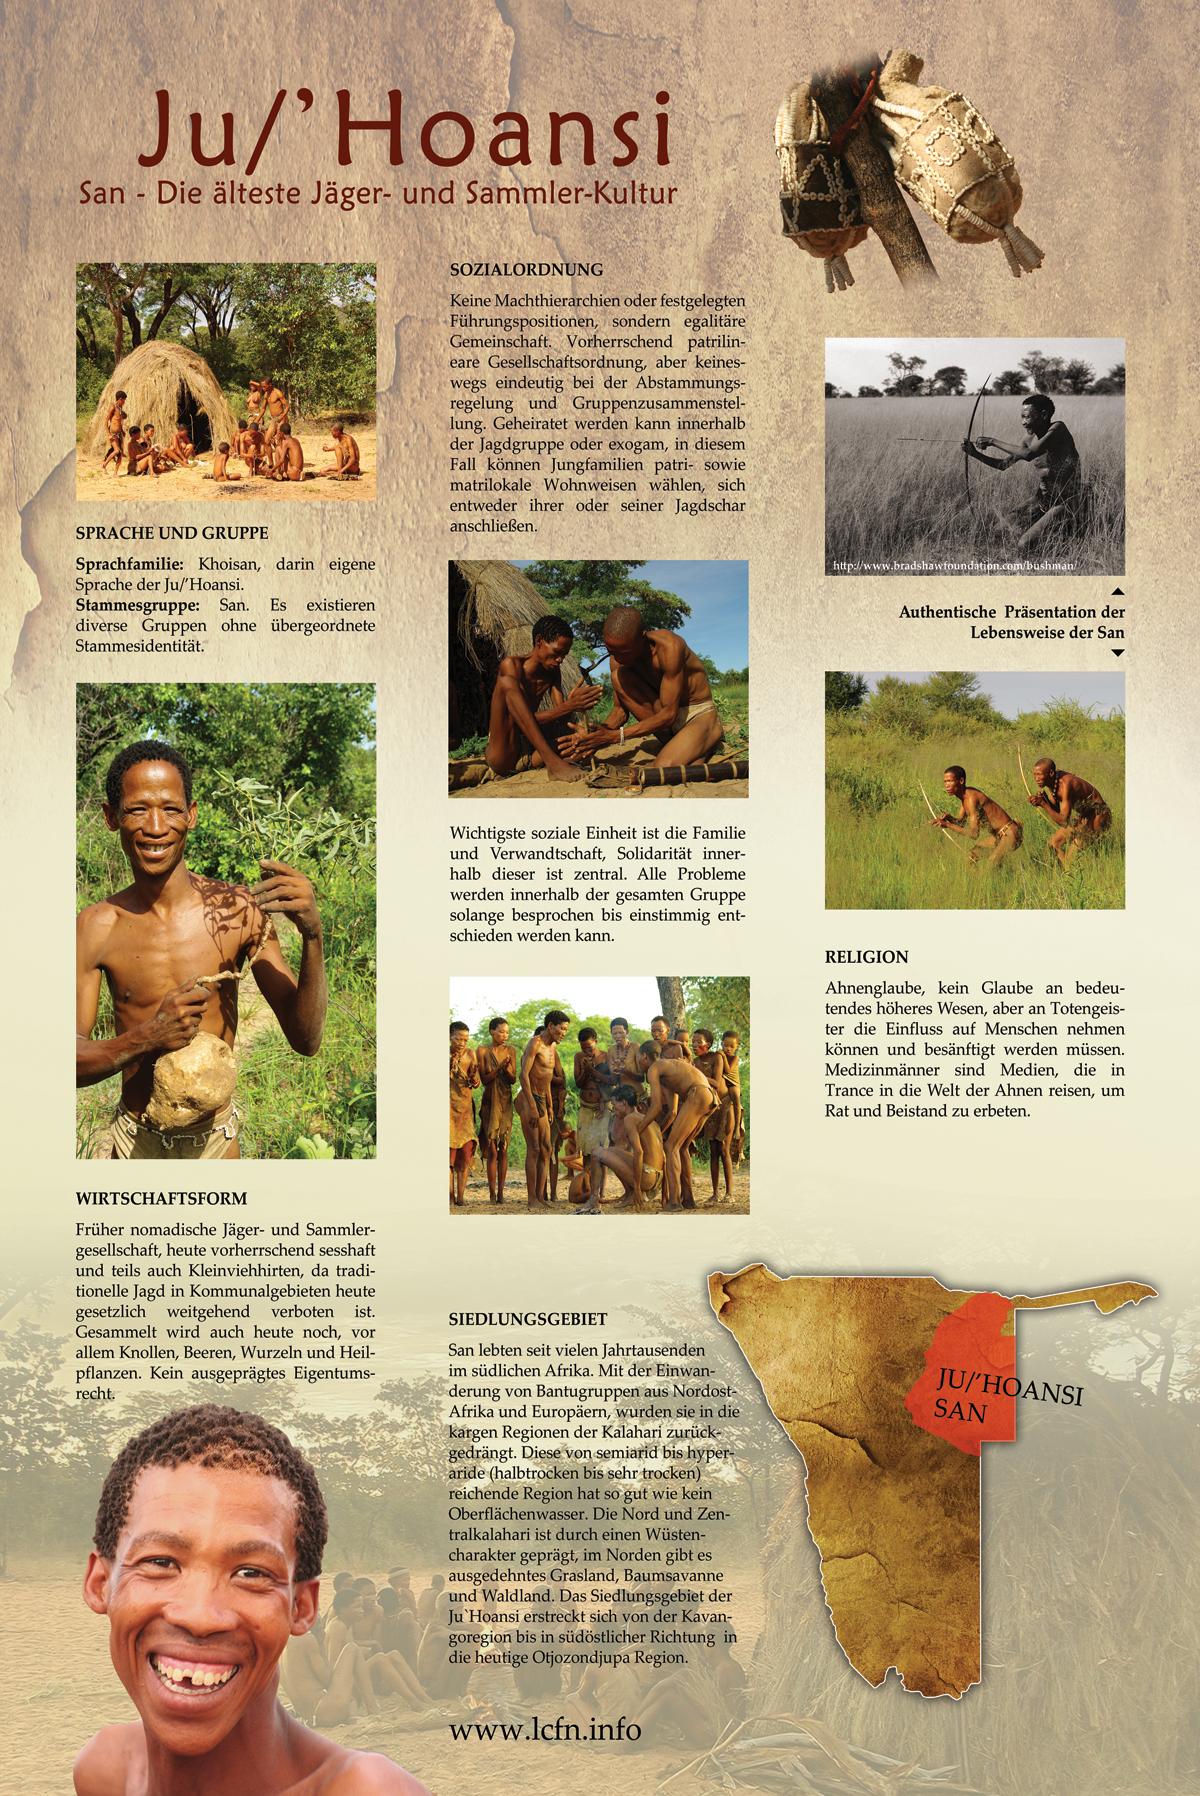 Informationen über die Ju/'Hoansi C) Living Culture Foundation LCFN